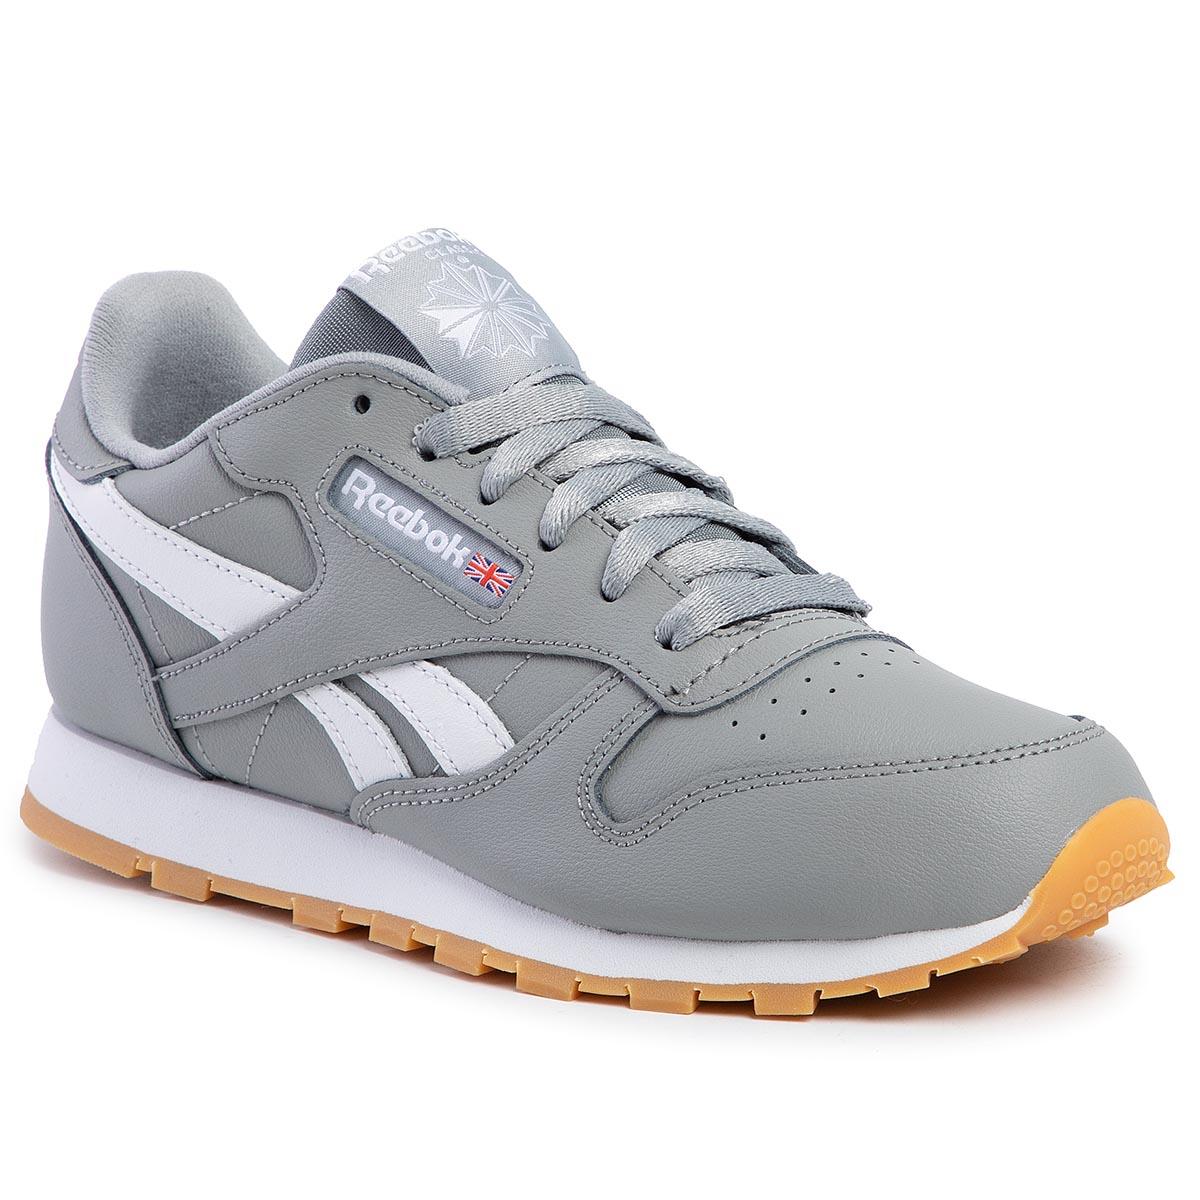 Topánky Reebok - Classic Leather DV9608 True Grey/White